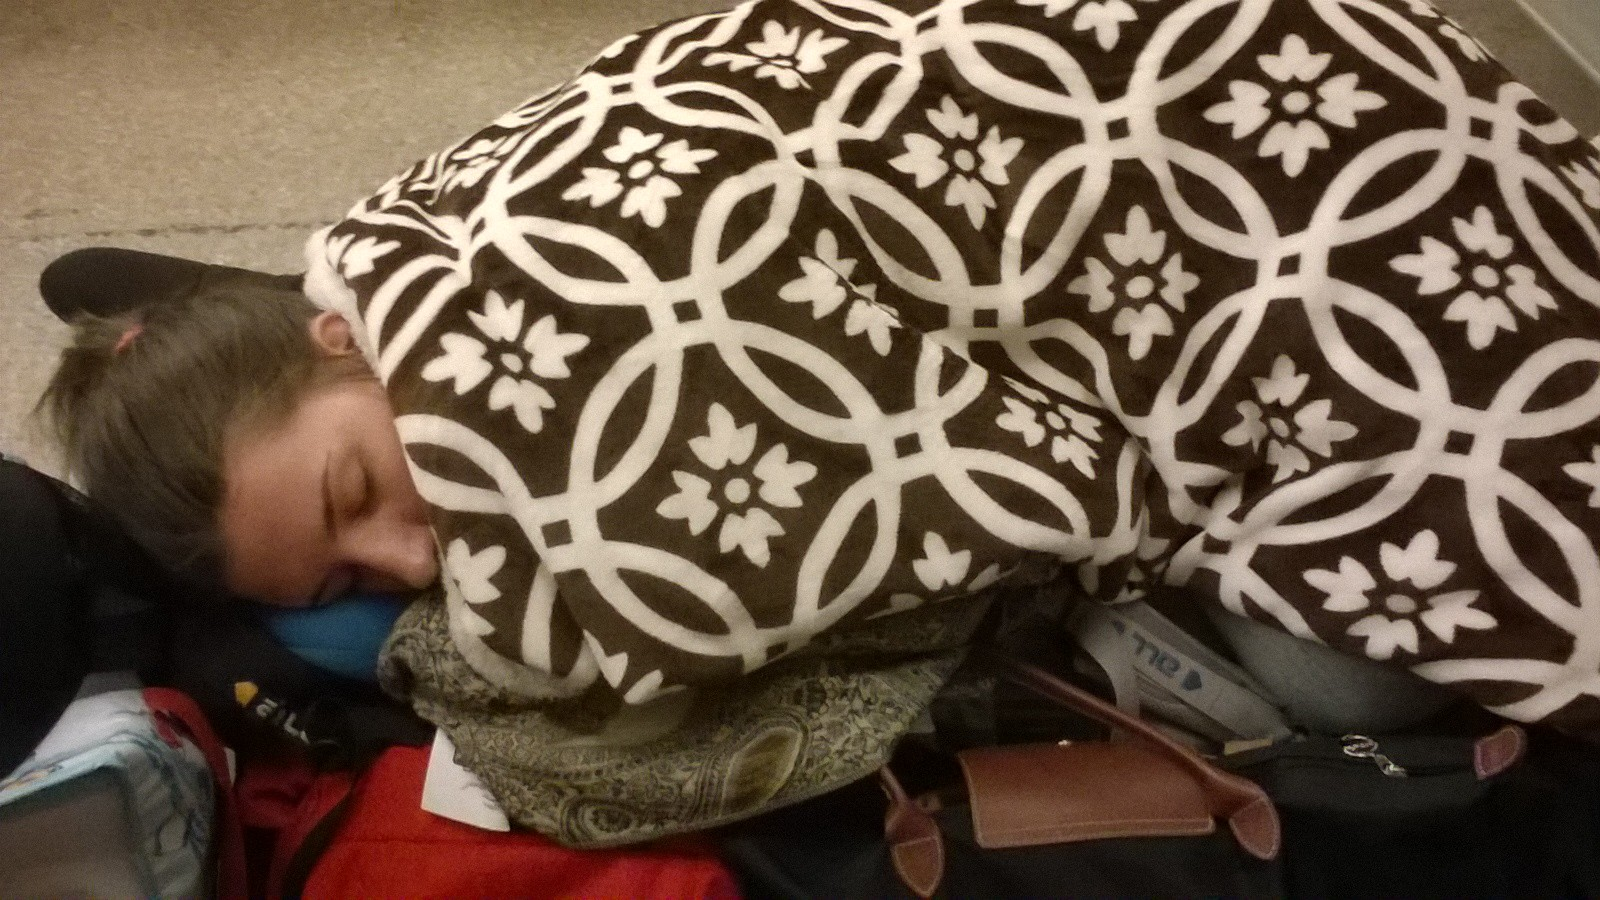 Alice sleeping on our backpacks at Savannah Greyhound station